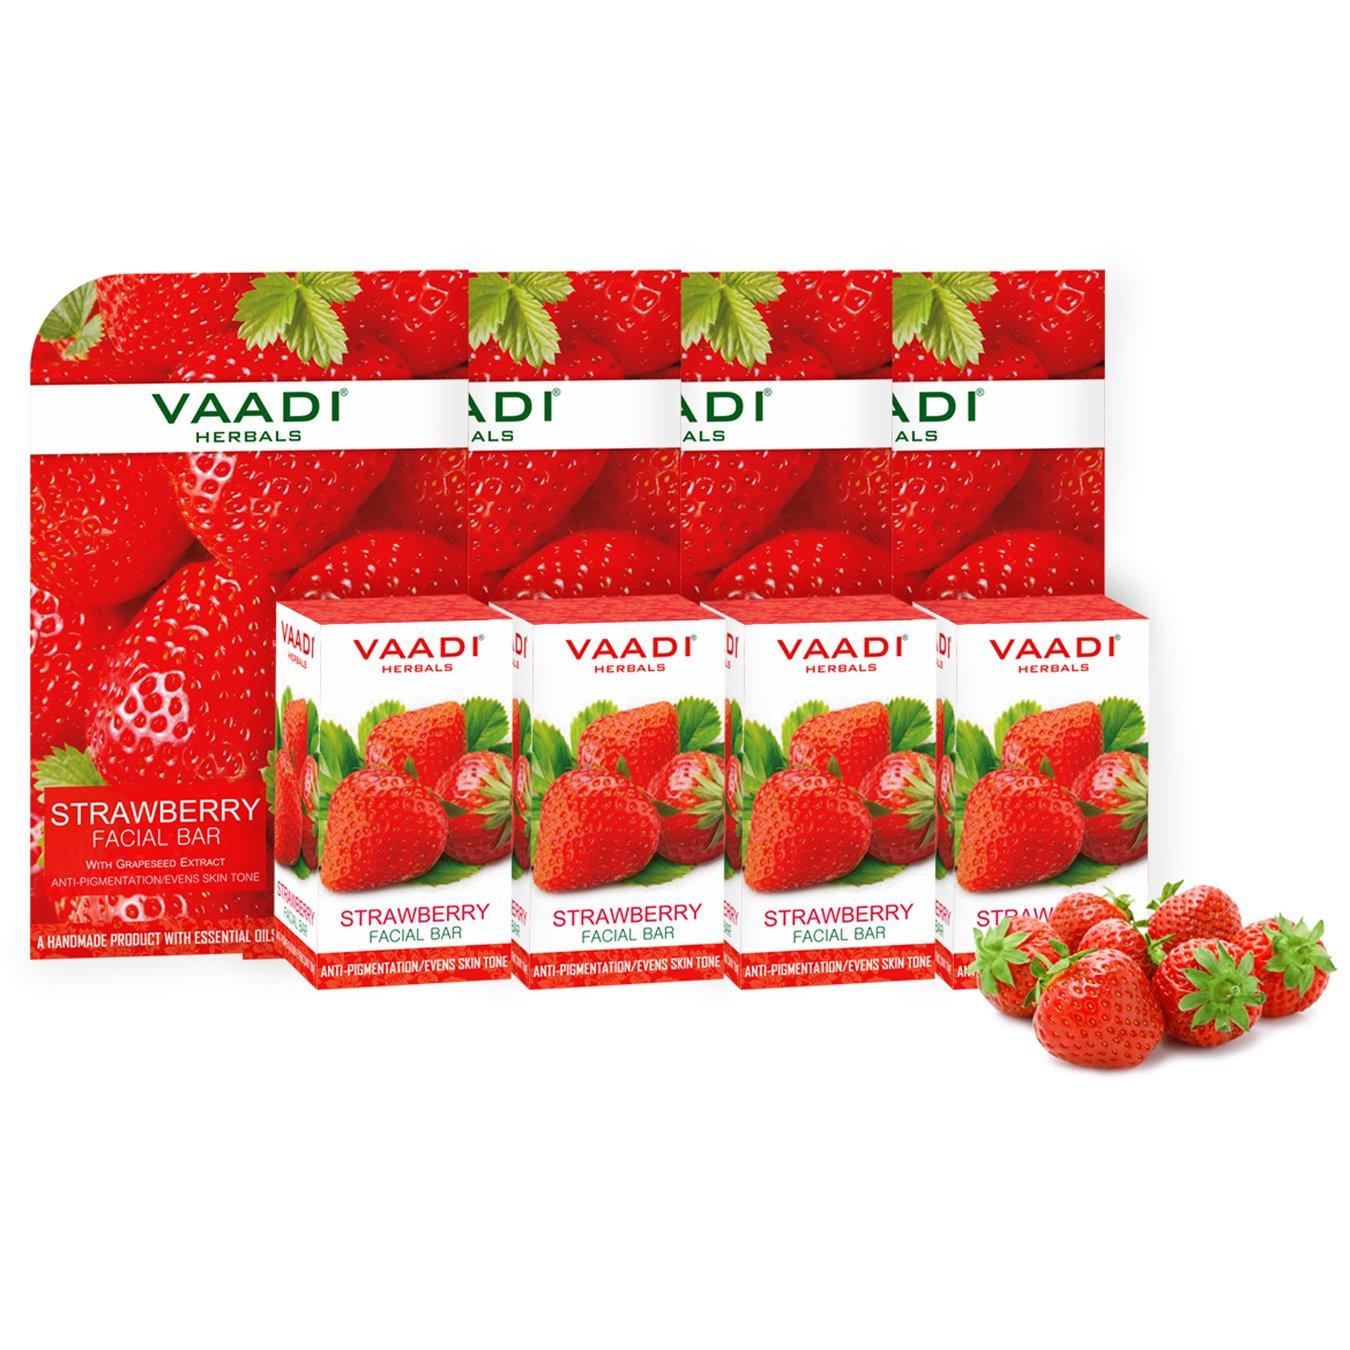 Vaadi Herbals Facial Bar Strawberry 25g Vaadi Herbals Pvt. Ltd